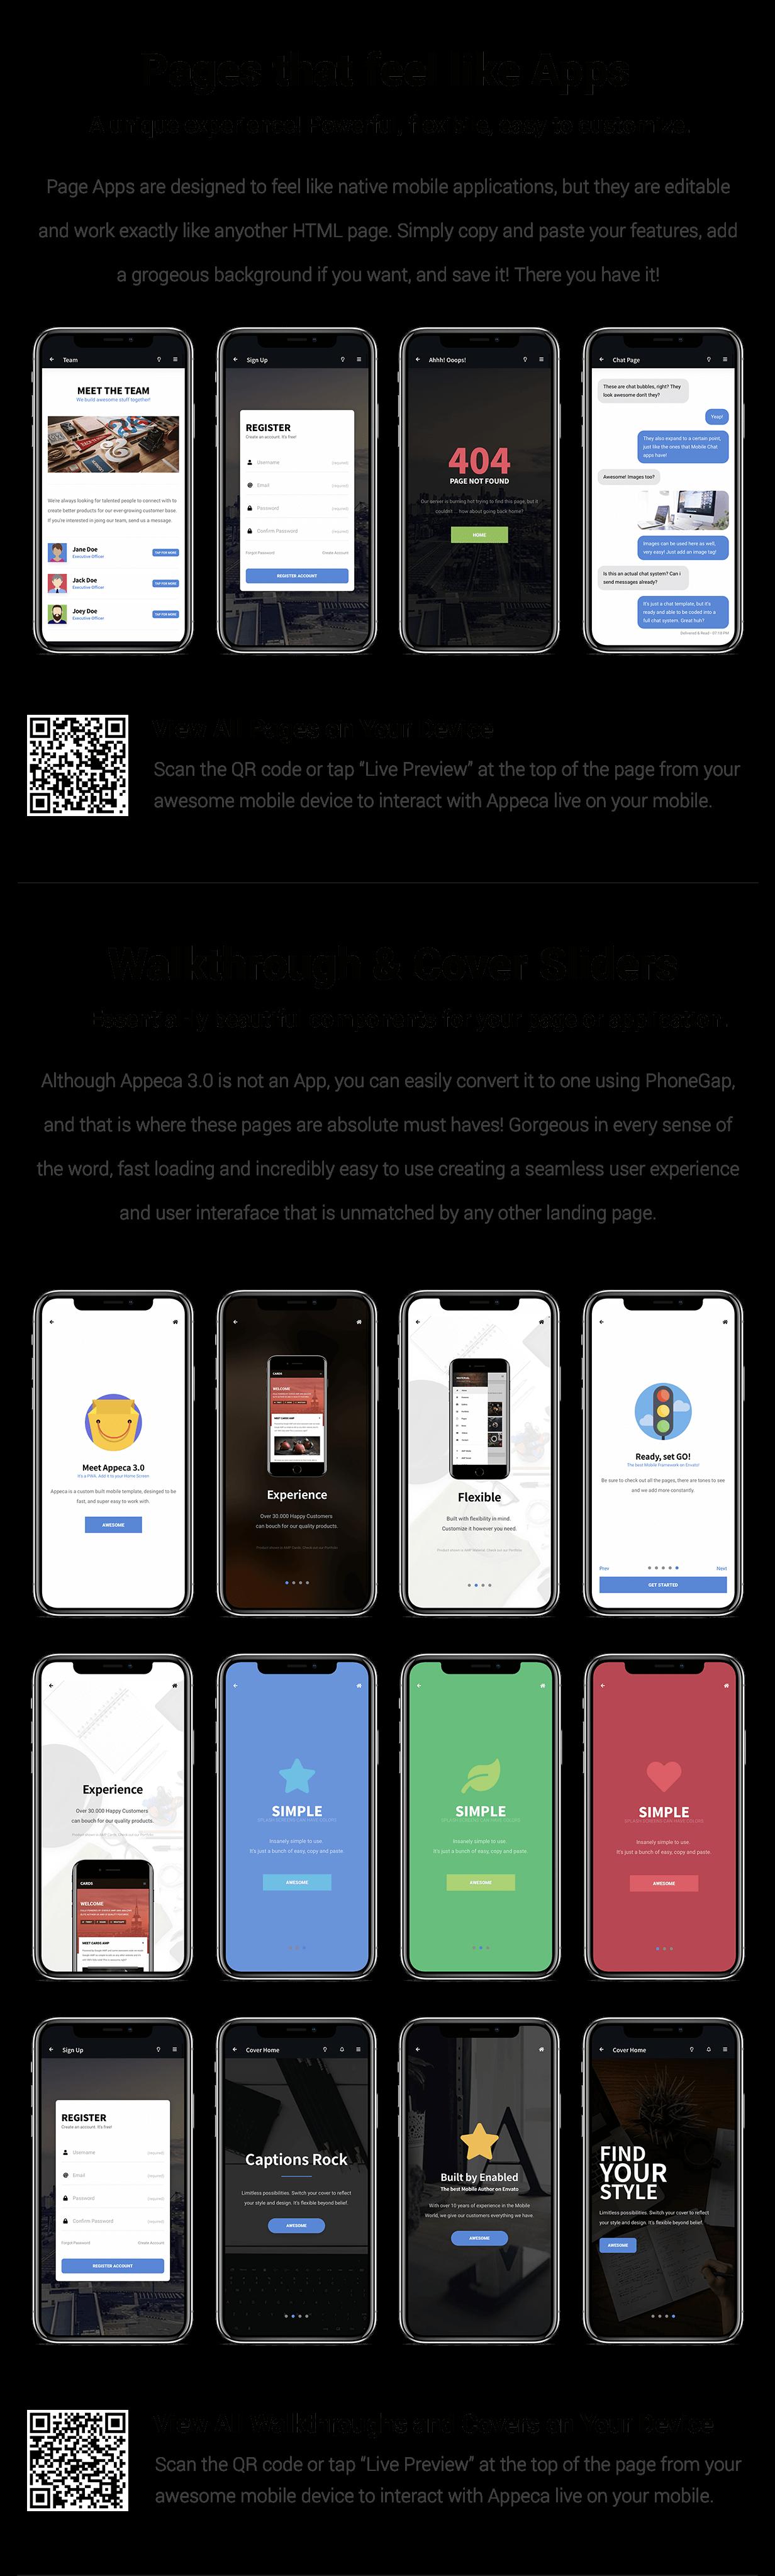 appeca 4b - Appeca Ultimate Mobile Template